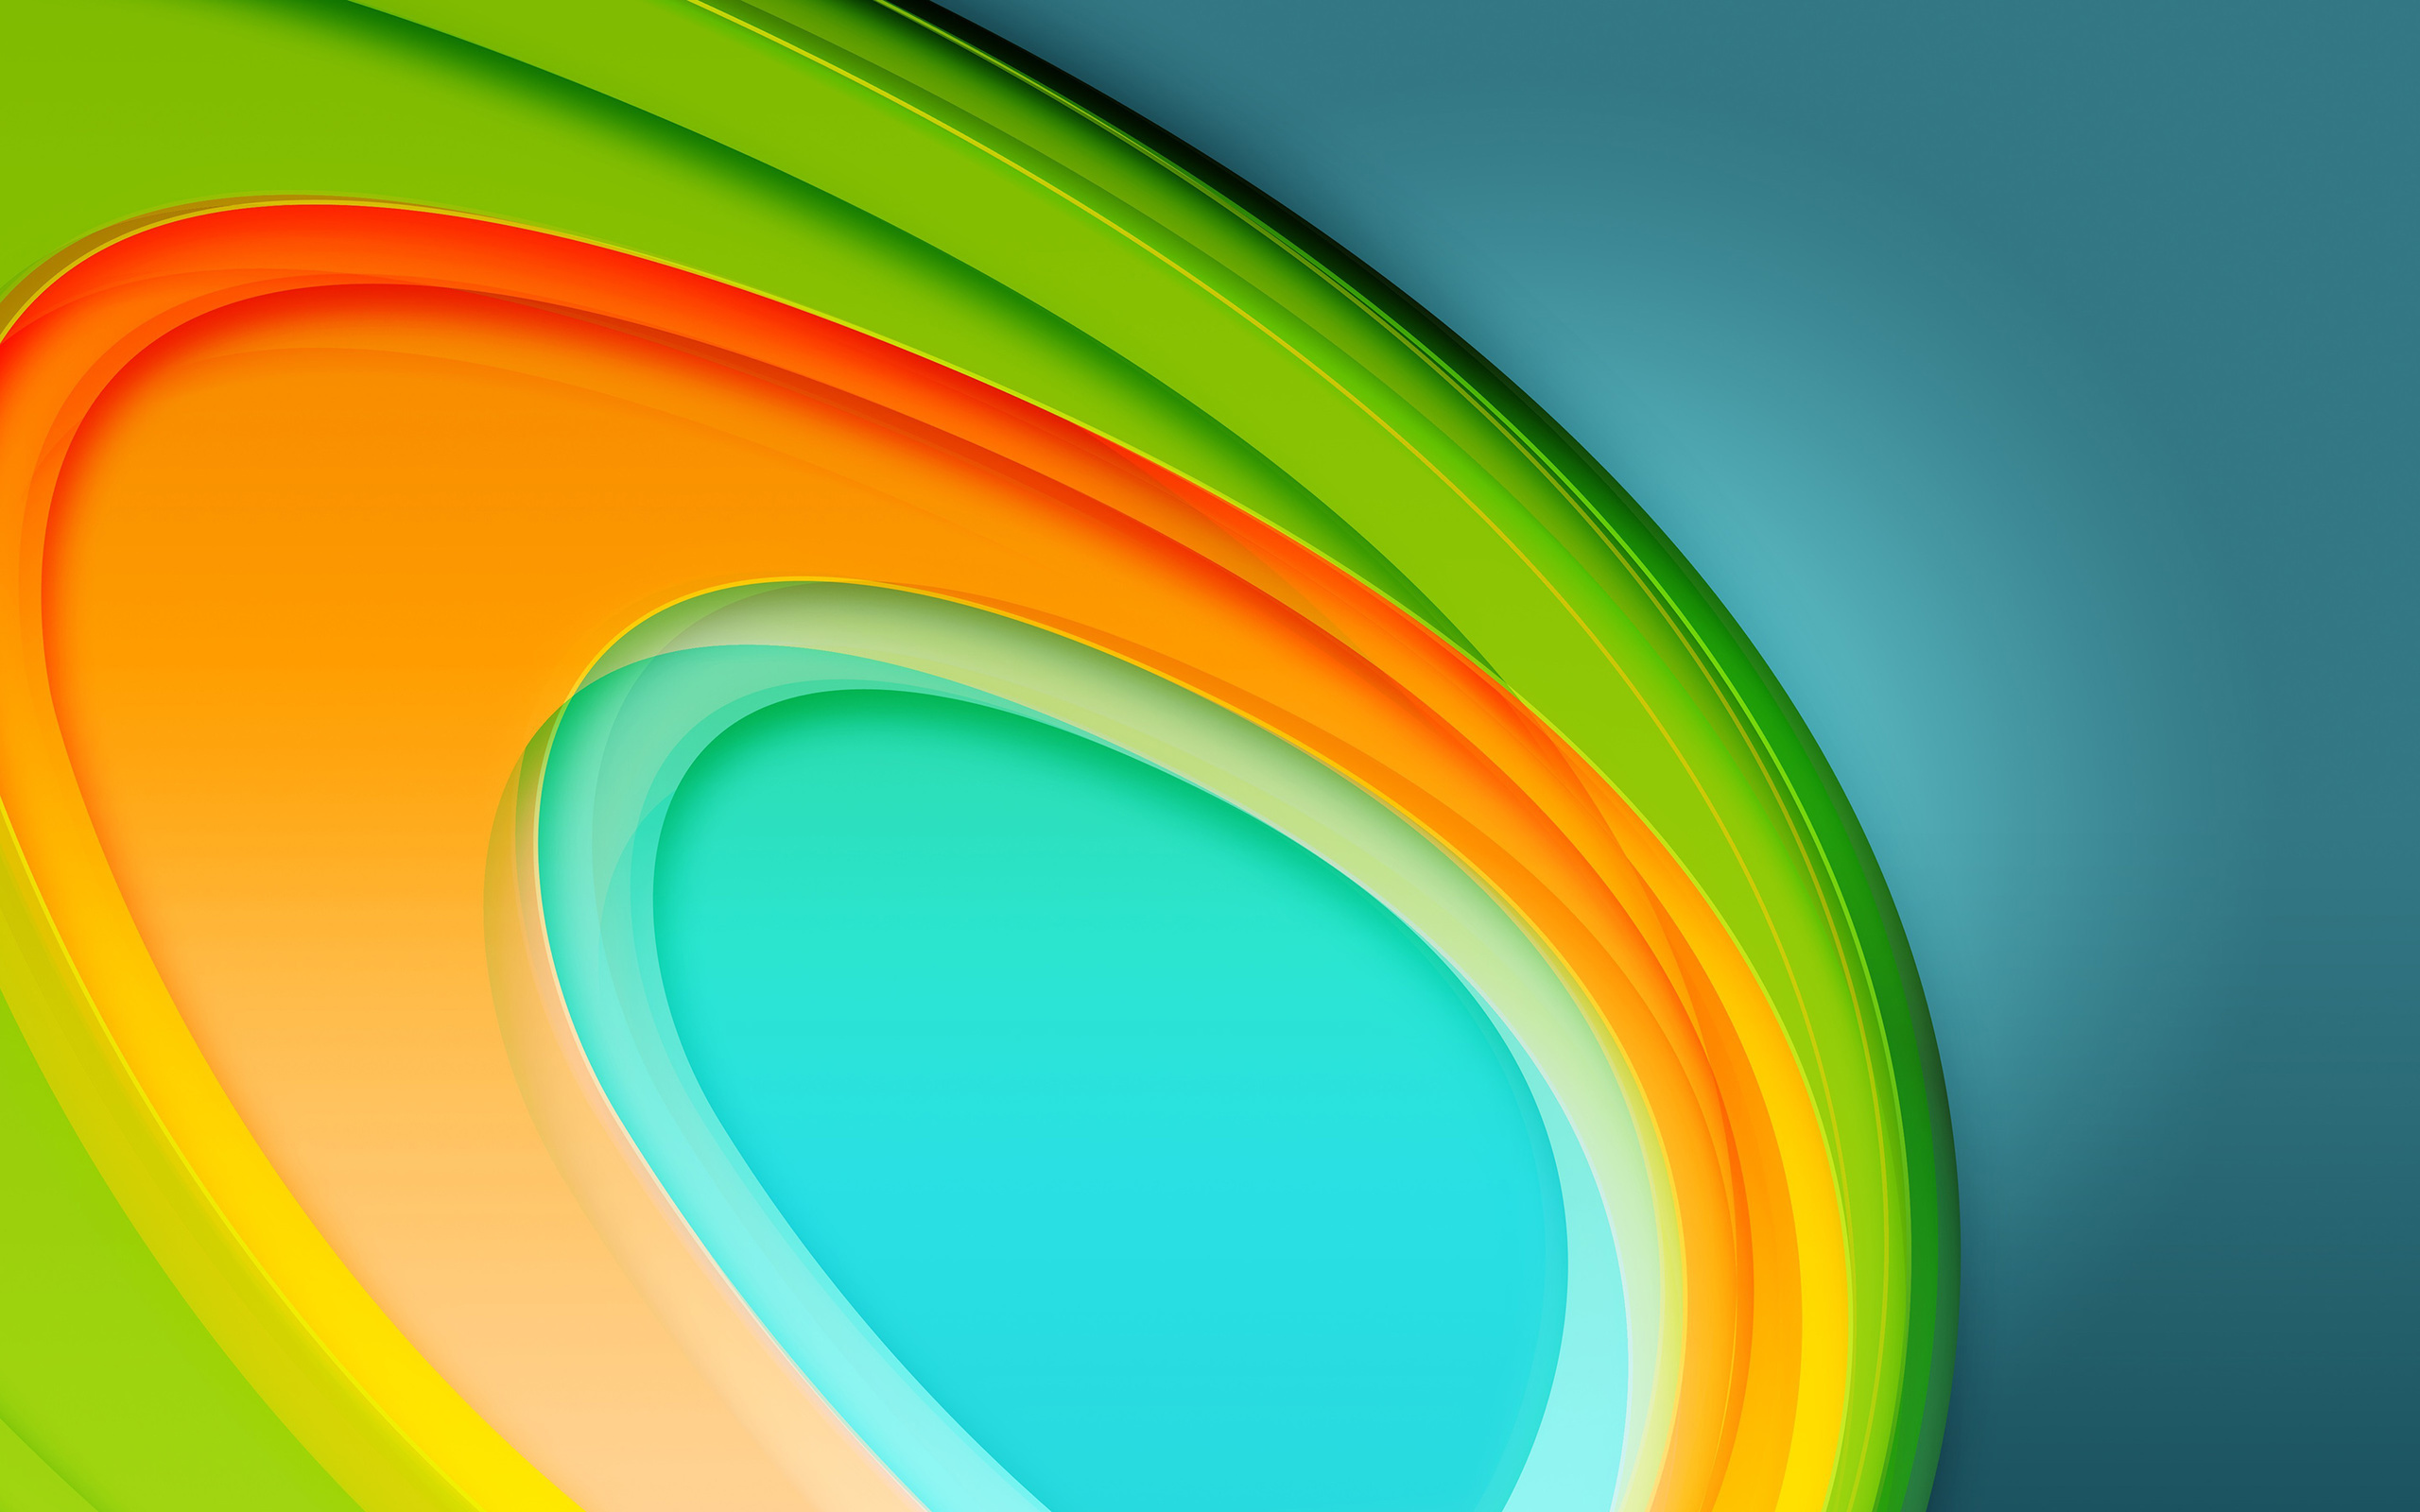 Colorful Circles 4K 5K (2560x1600)